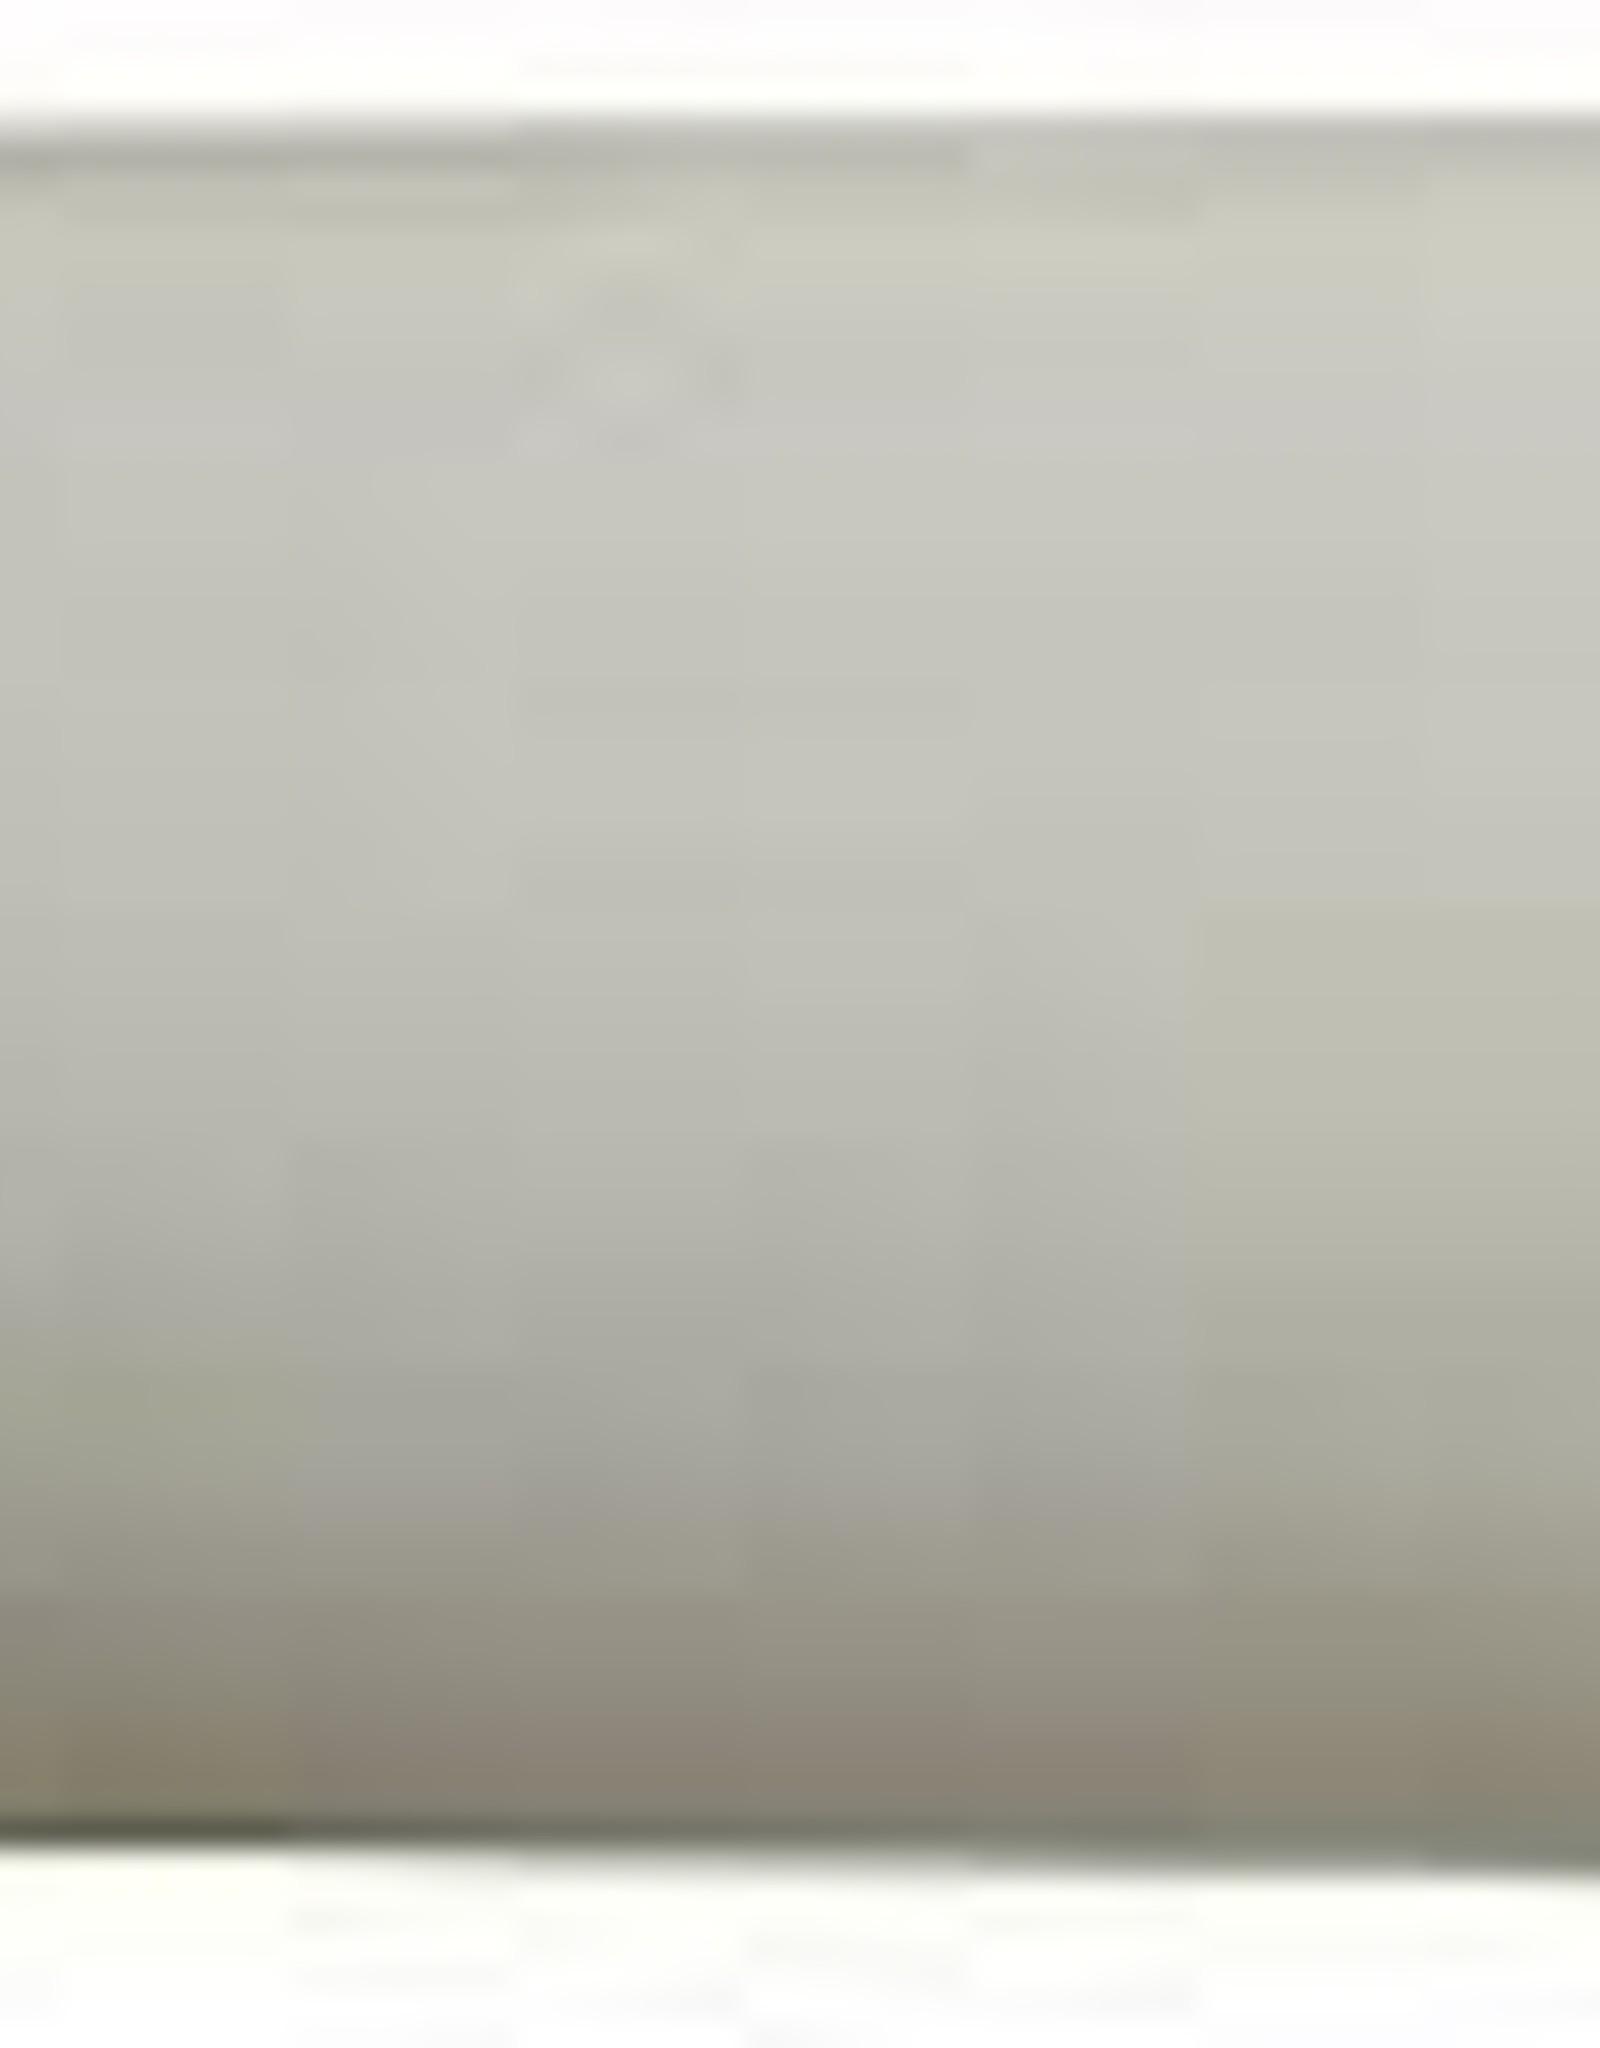 "1"" x 10' Length Sch40 PVC Pipe"